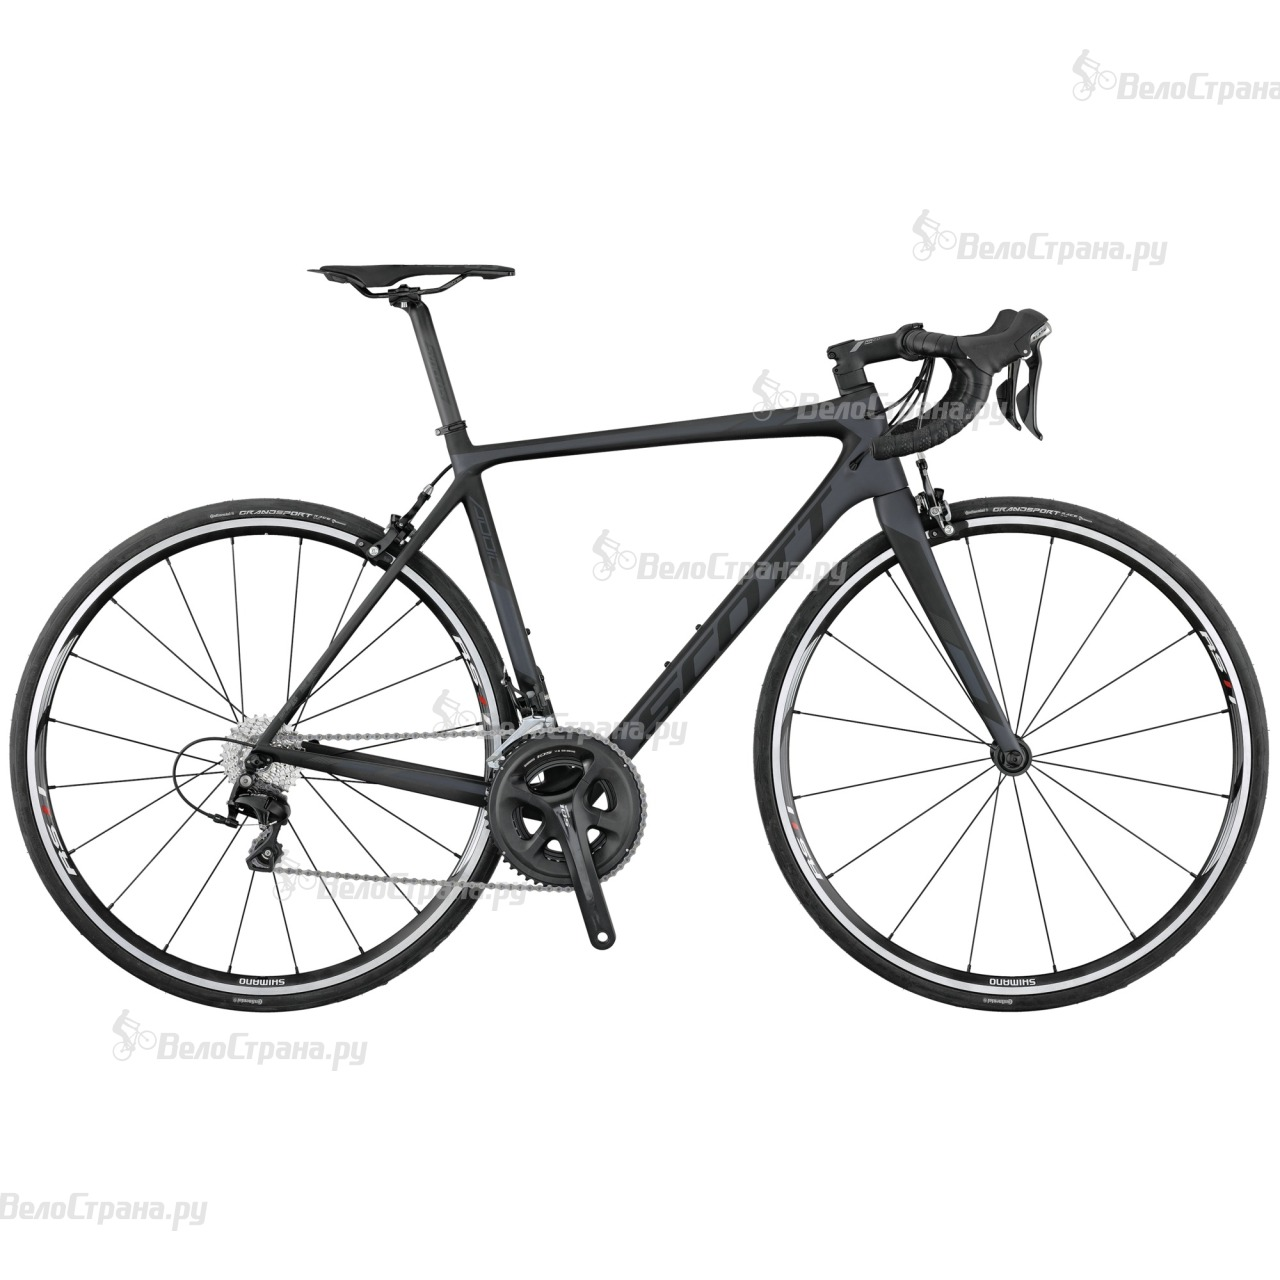 Велосипед Scott Addict 30 (2017) scott addict sl compact 2015